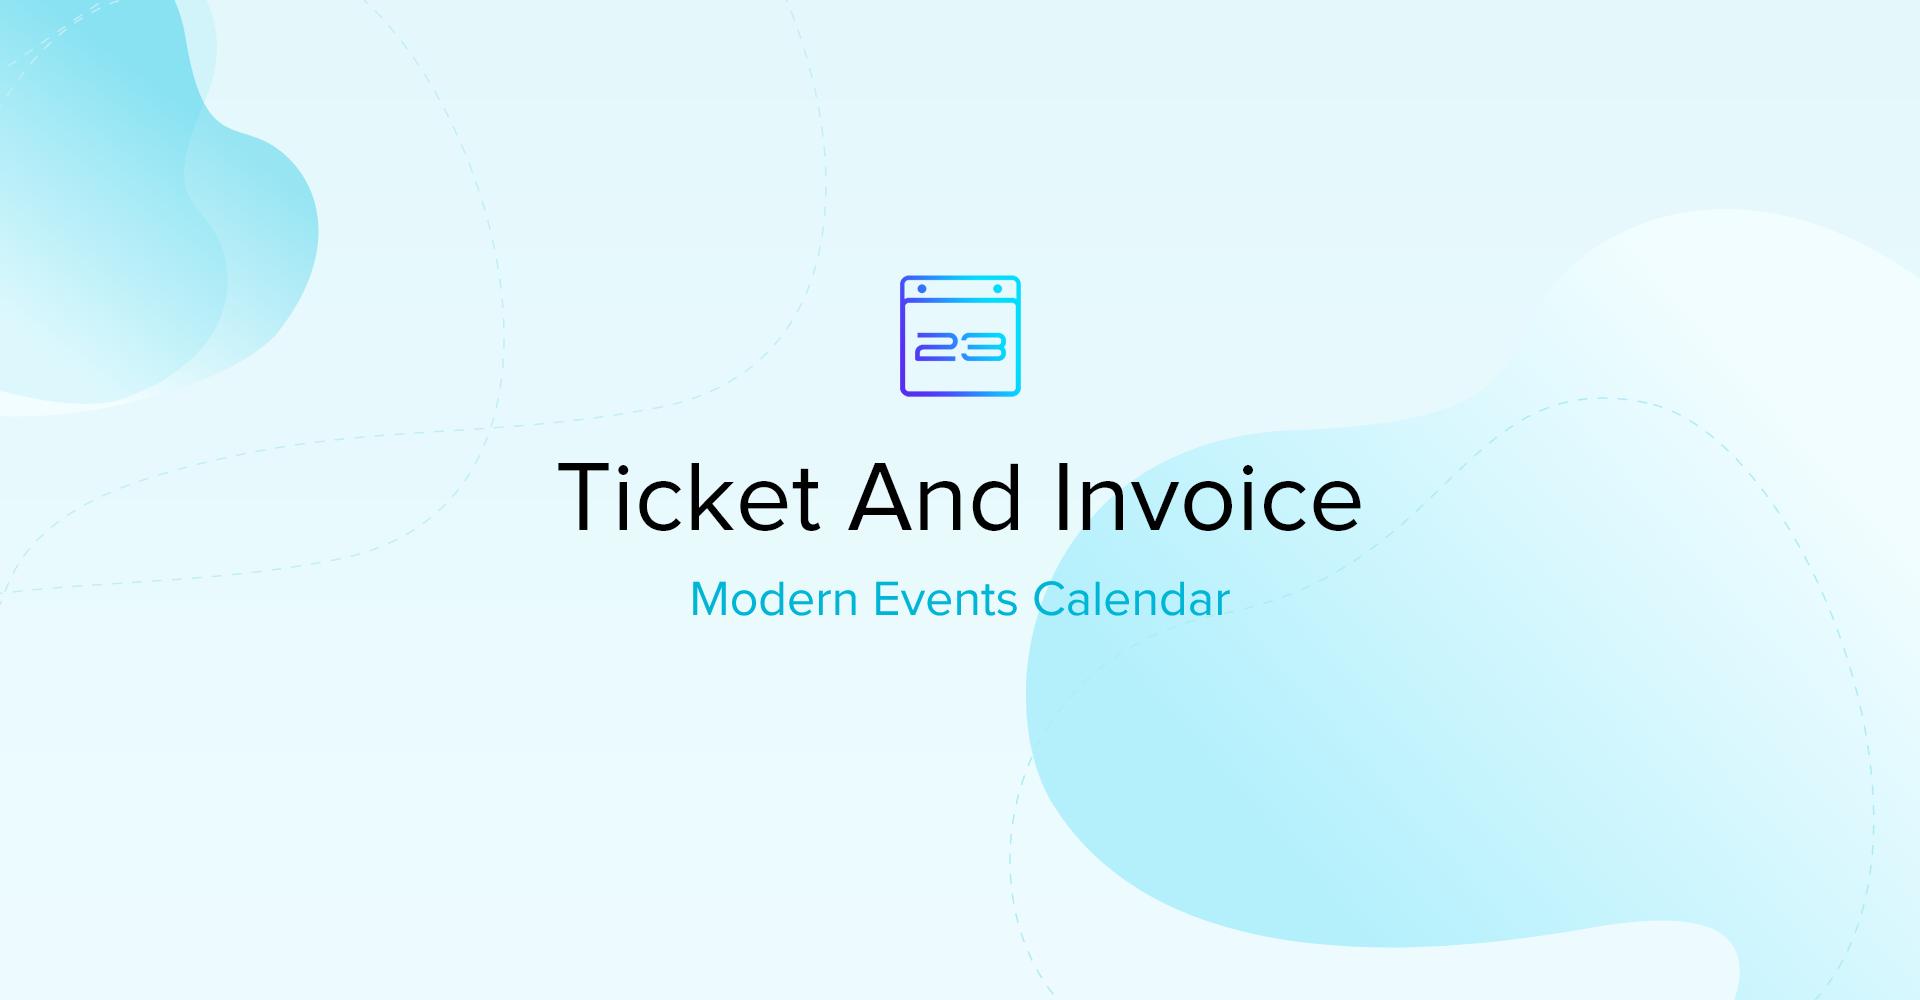 Ticket and Invoice MEC 1.2.6